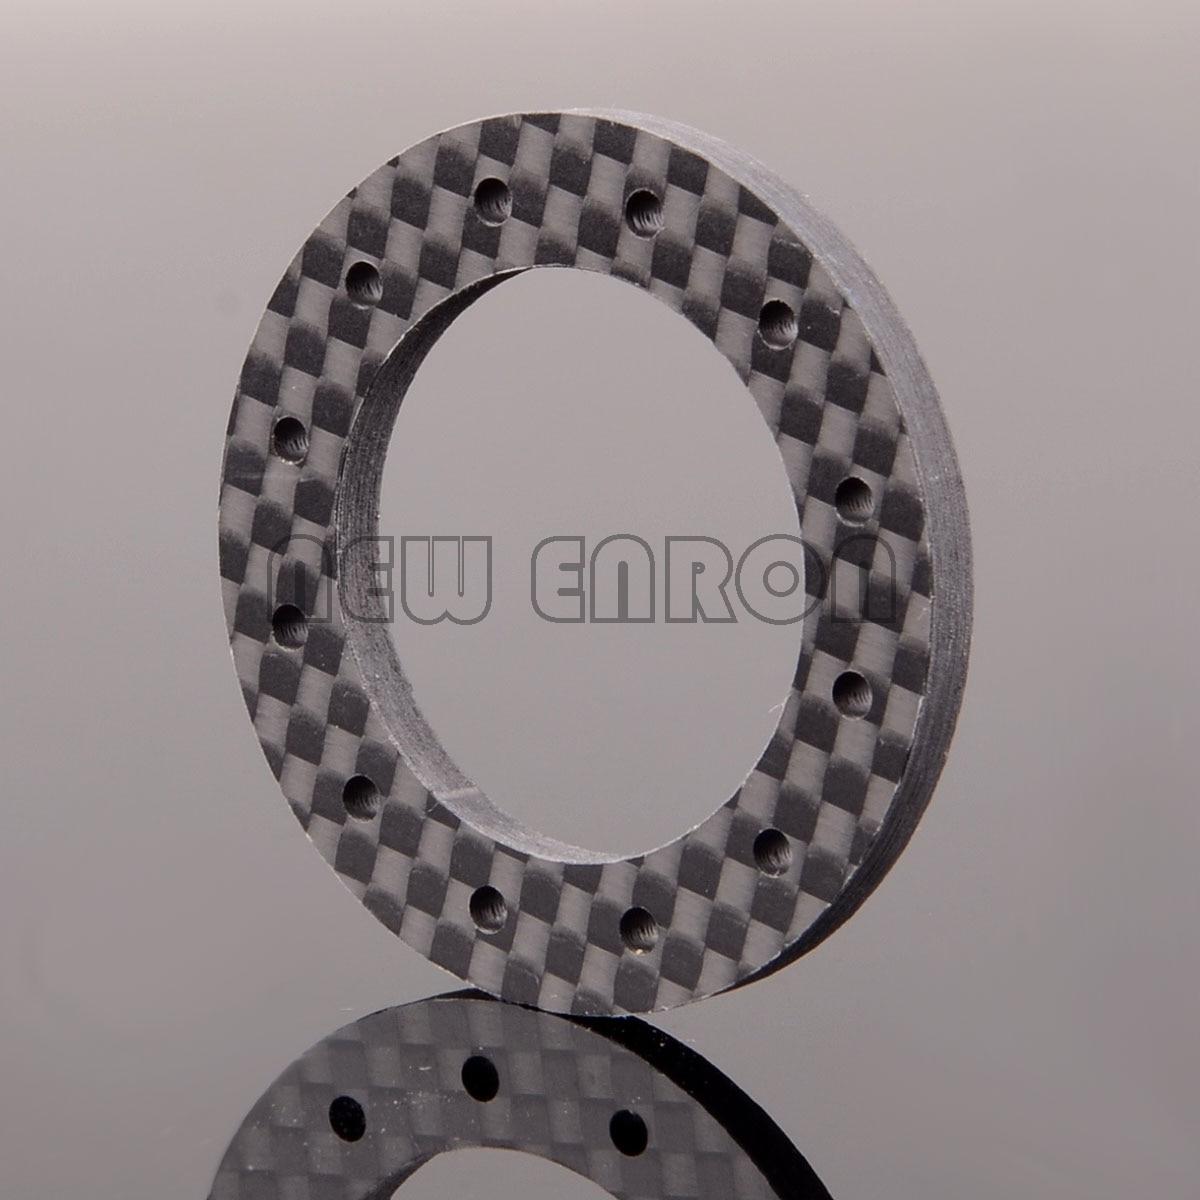 NEW ENRON 1pc Carbon Fiber Slipper Clutch Pad 3MM Fit For 1/10 Traxxas REVO E-REVO SUMMIT SLASH 4X4 T-Maxx E-Maxx 5352 5352X